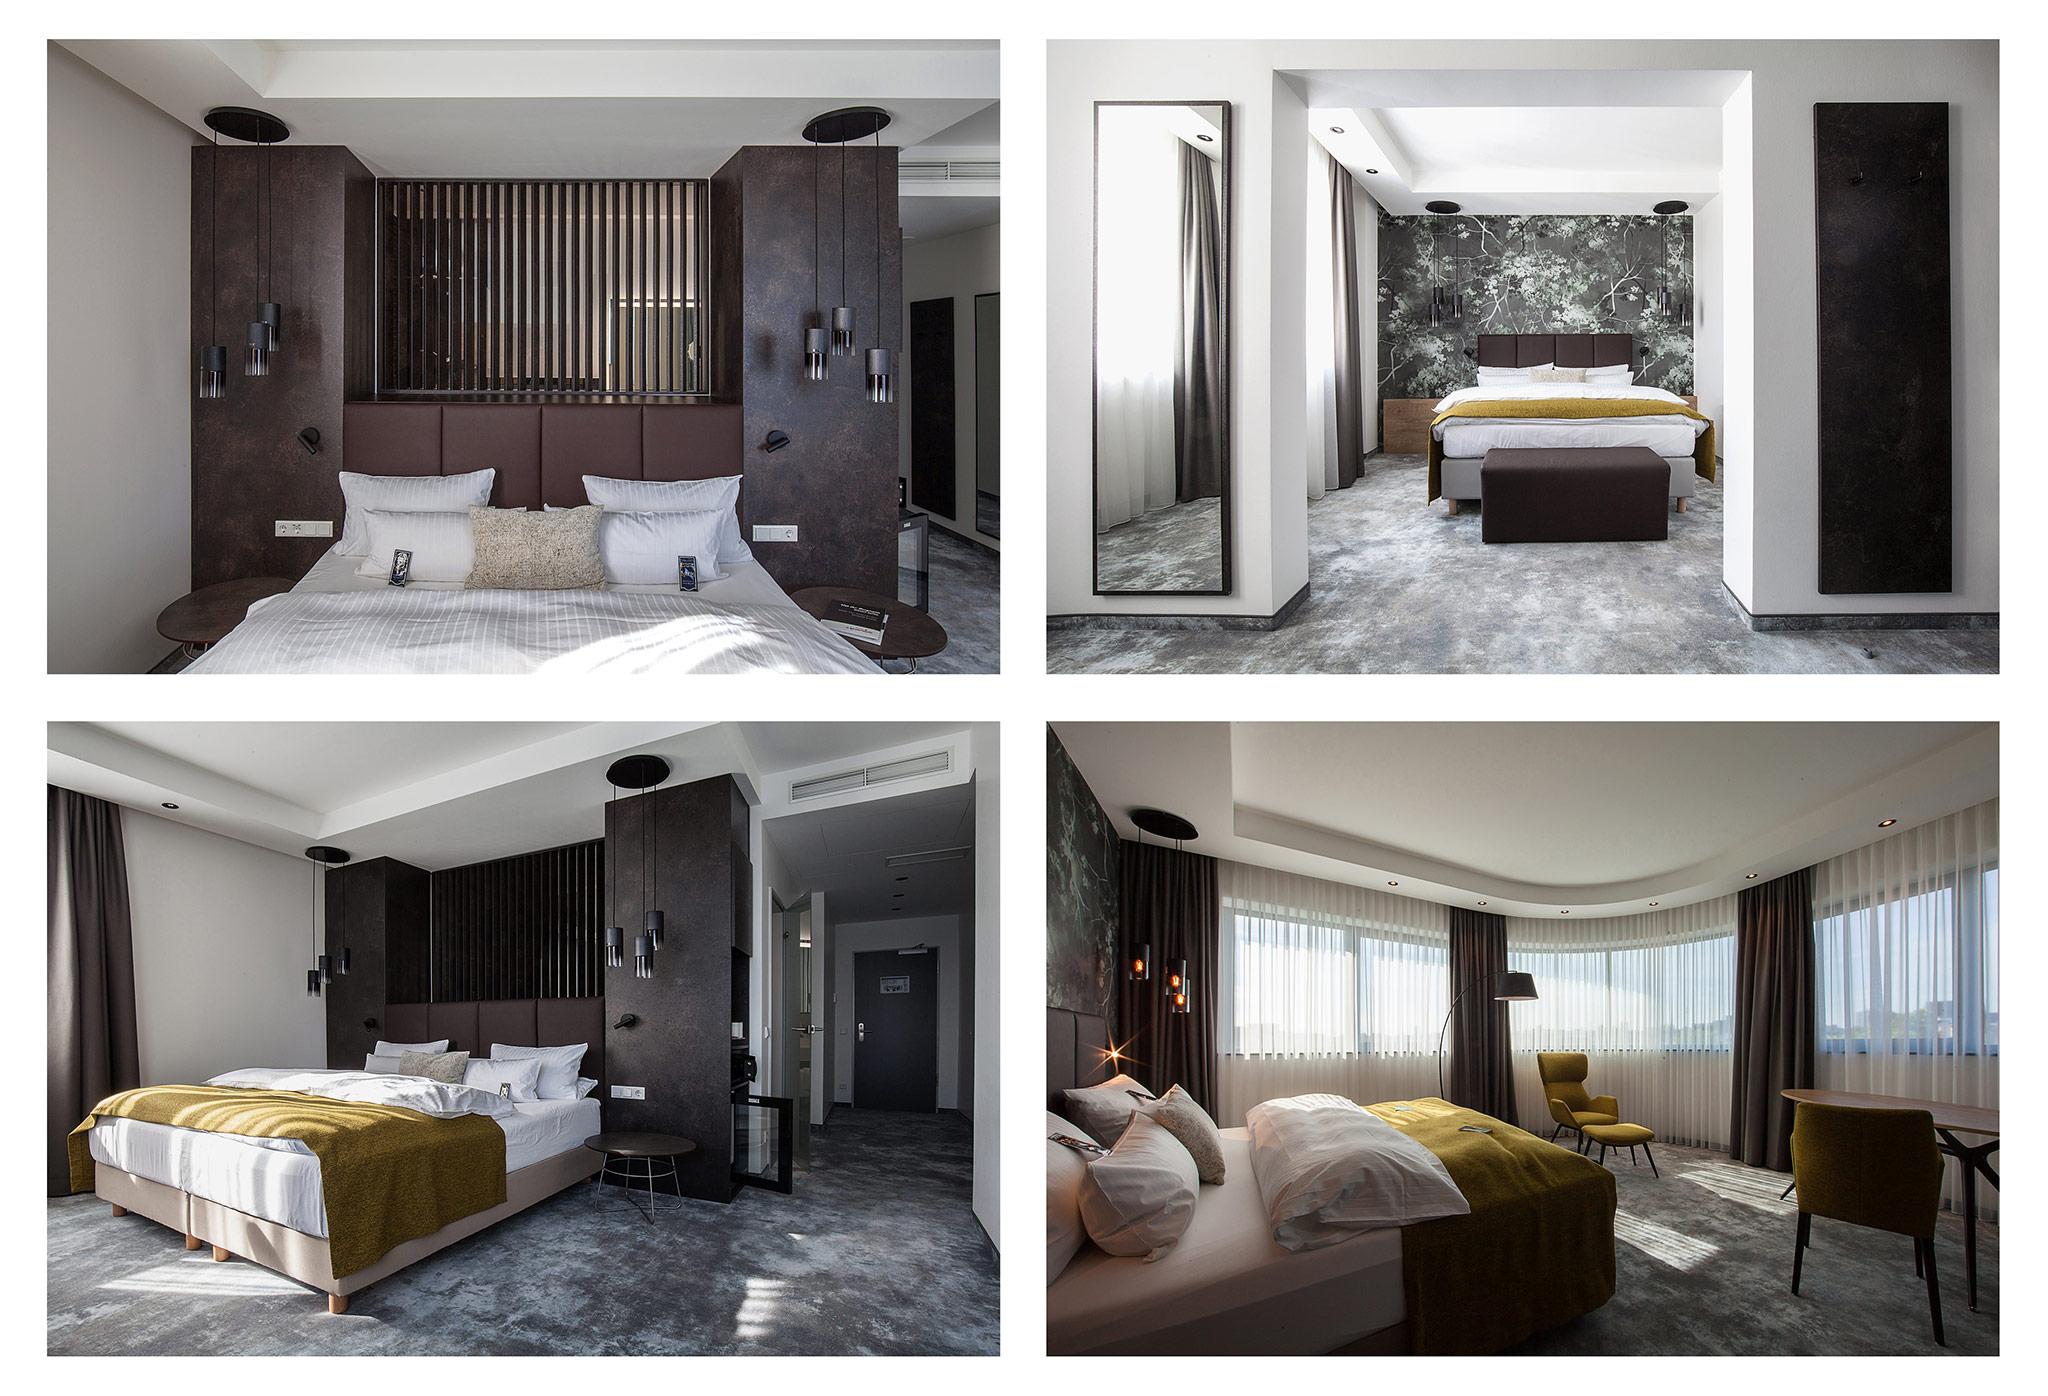 Hotel Esplanade - Foto: Wilfried Malkusch